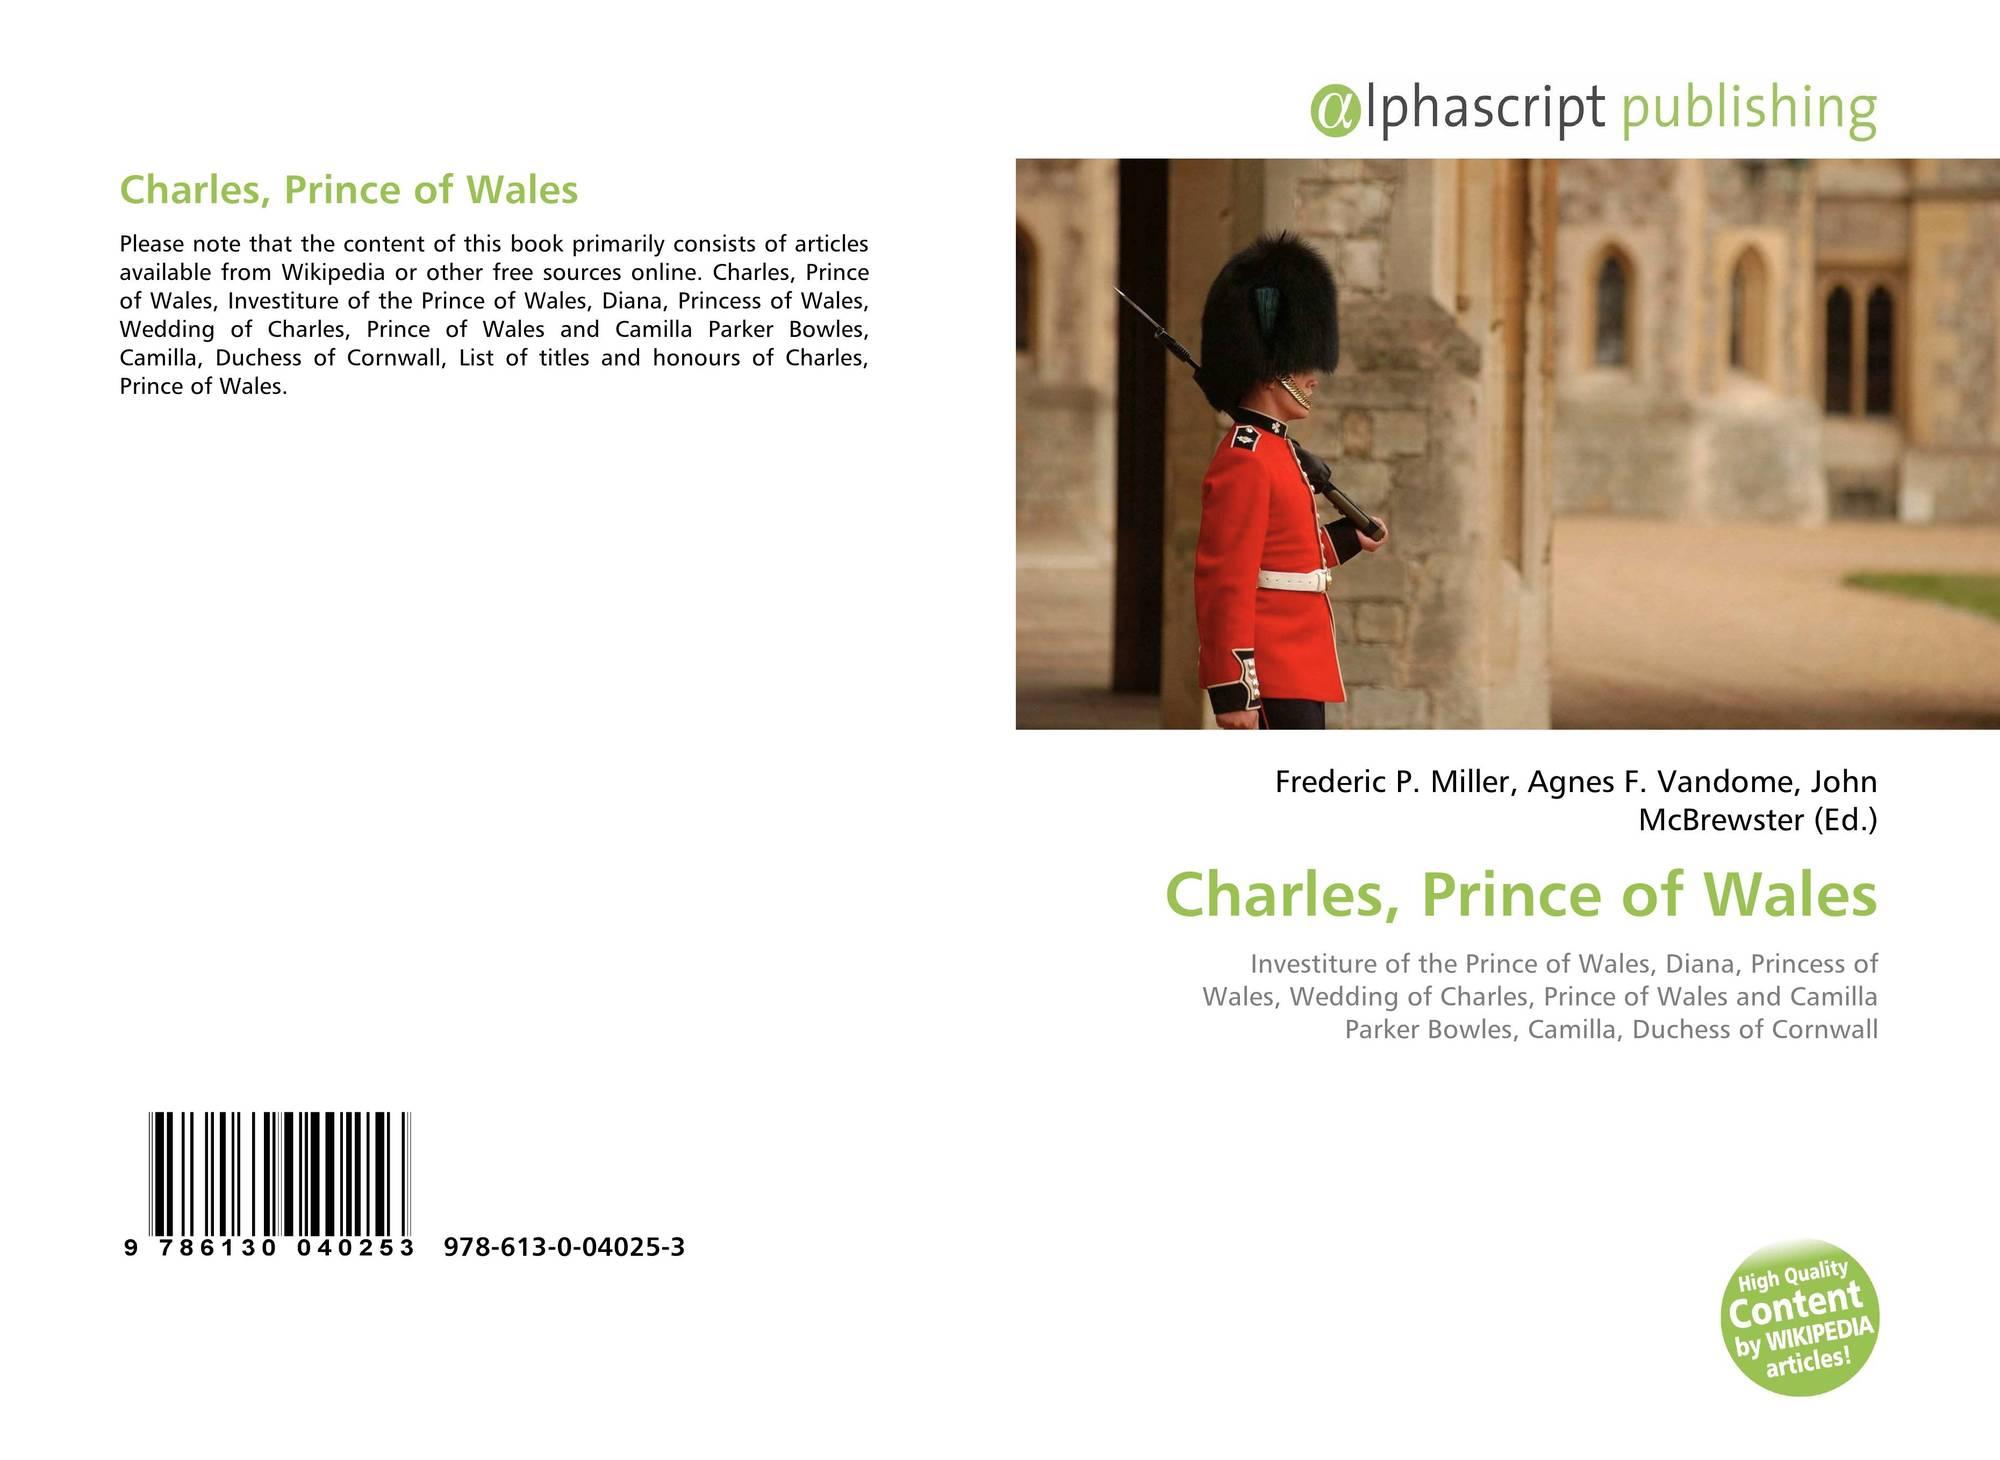 Charles, Prince of Wales, 978-613-0-04025-3, 6130040253 ,9786130040253